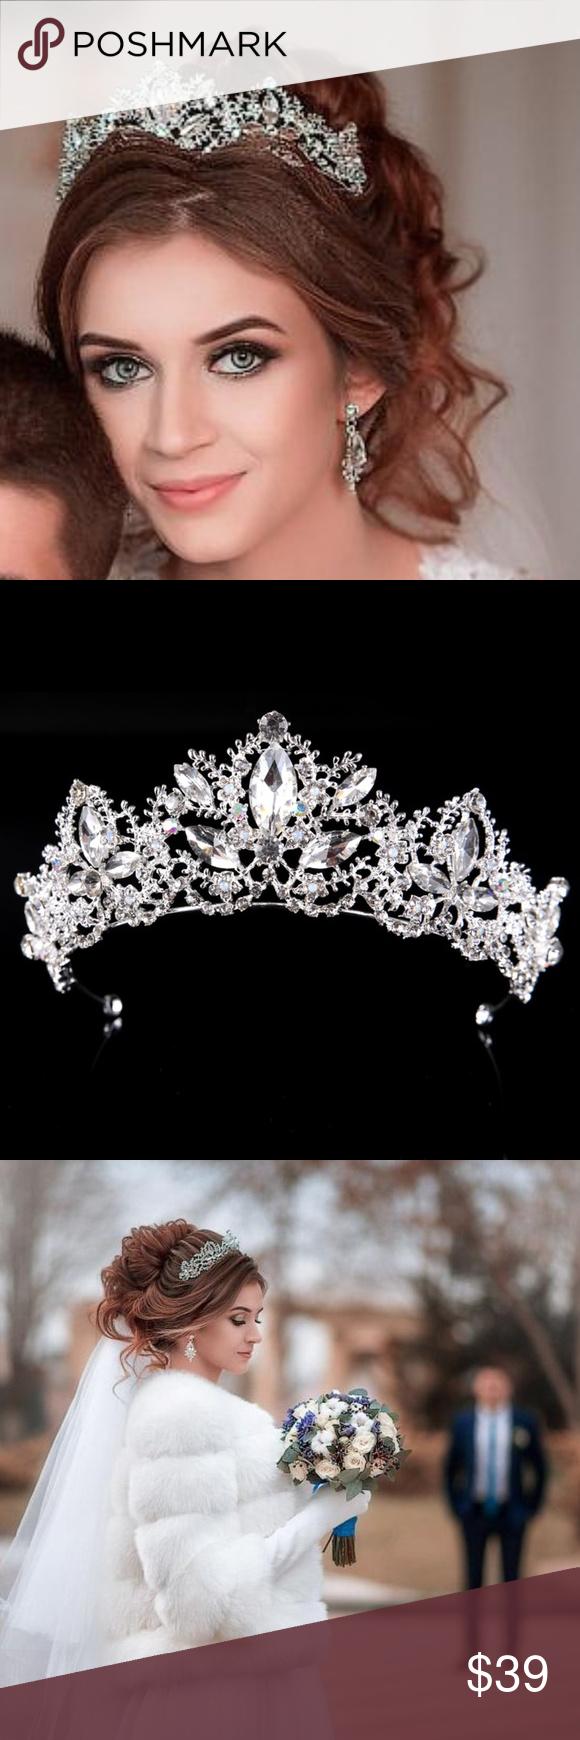 New Bridal Rhinestone Tiara Crown Wedding Silver Boutique